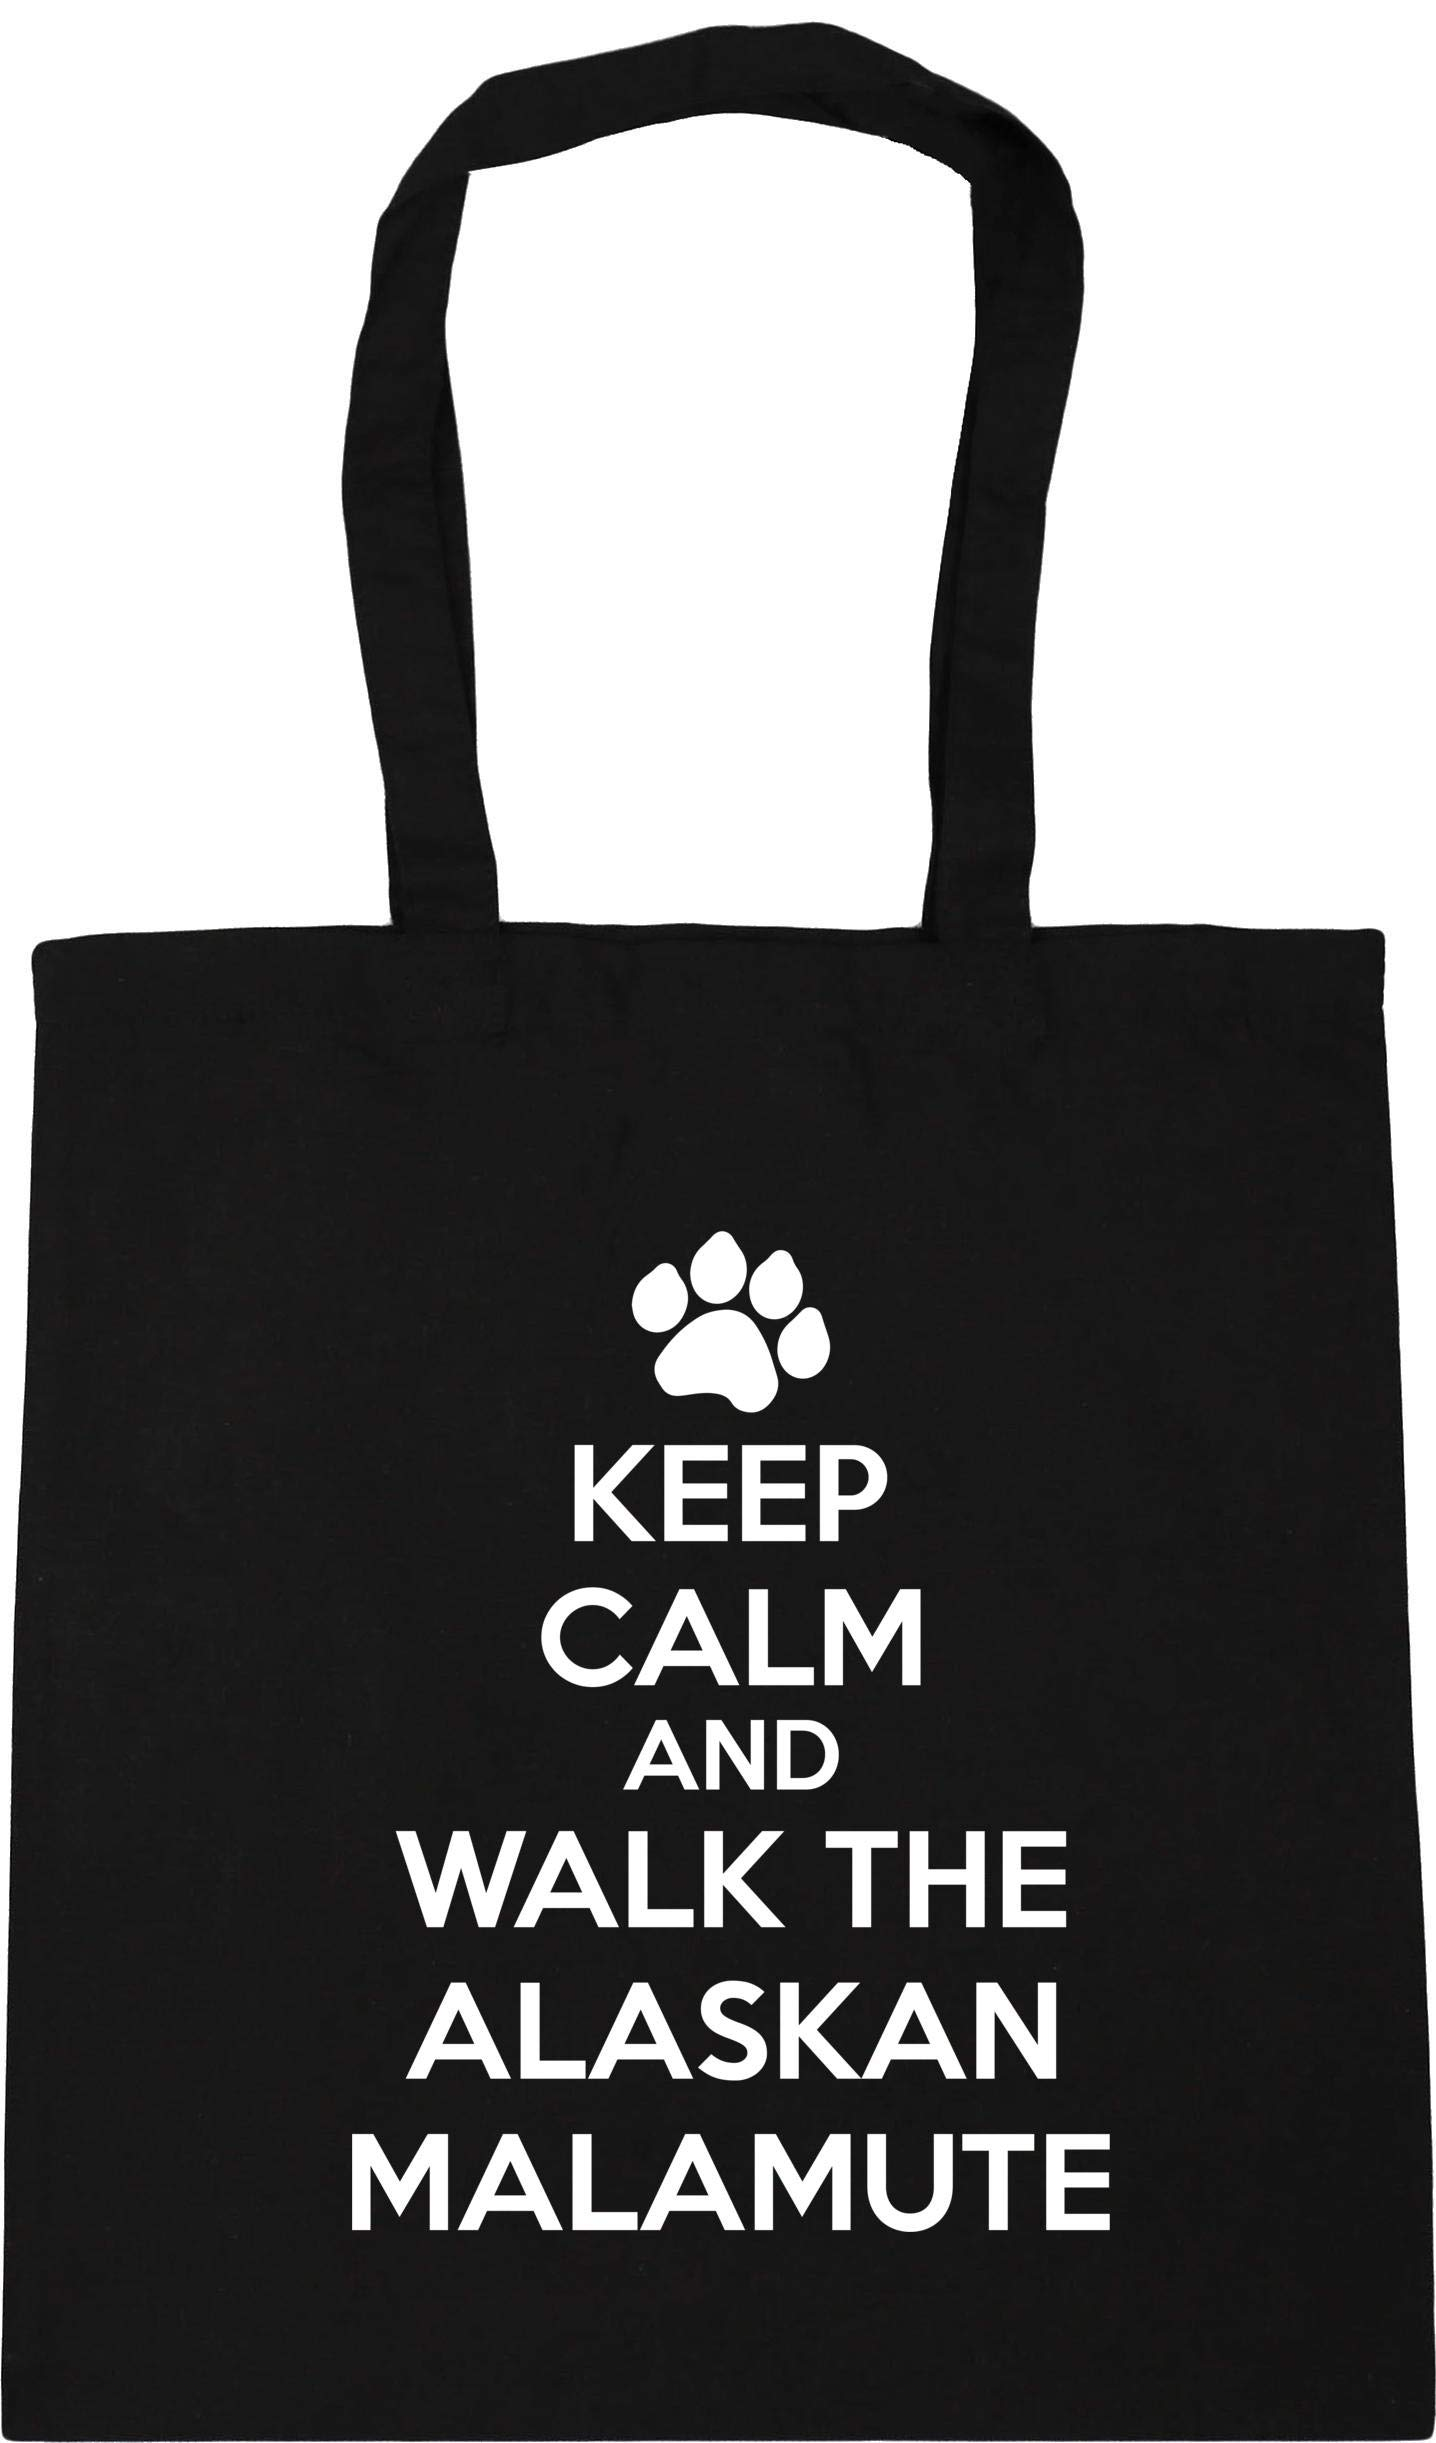 Hippowarehouse Keep calm and walk the alaskan malamute – dog Tote Shopping Gym Beach Bag 42cm x38cm, 10 litres